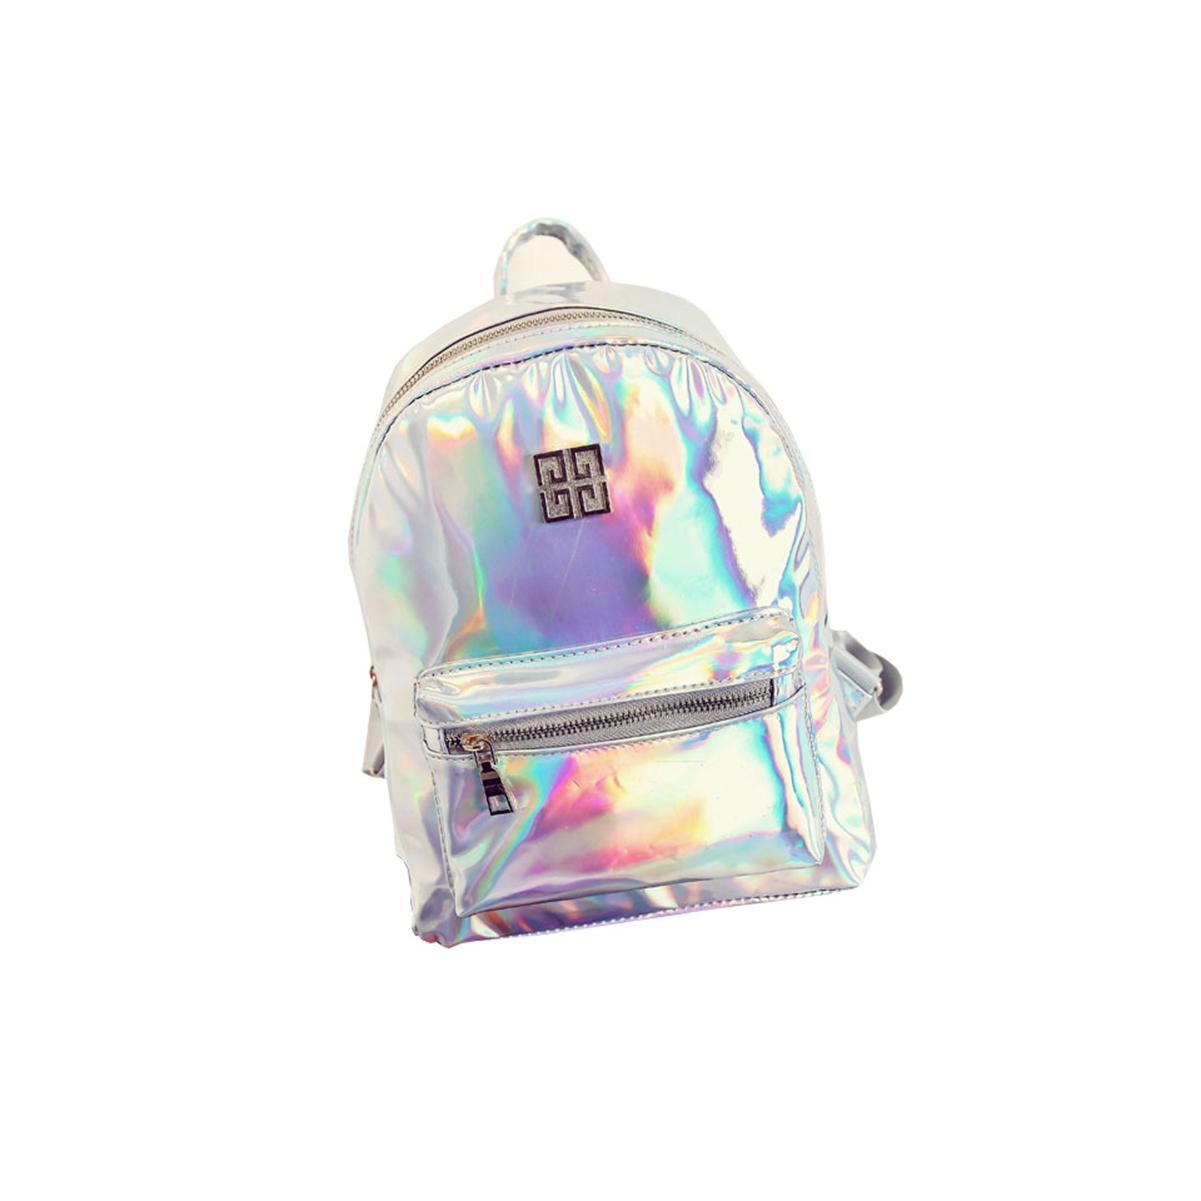 [EU Direct] Women Fashion NewGirl Hologram Holographic Laser PVC School Backpack Bag